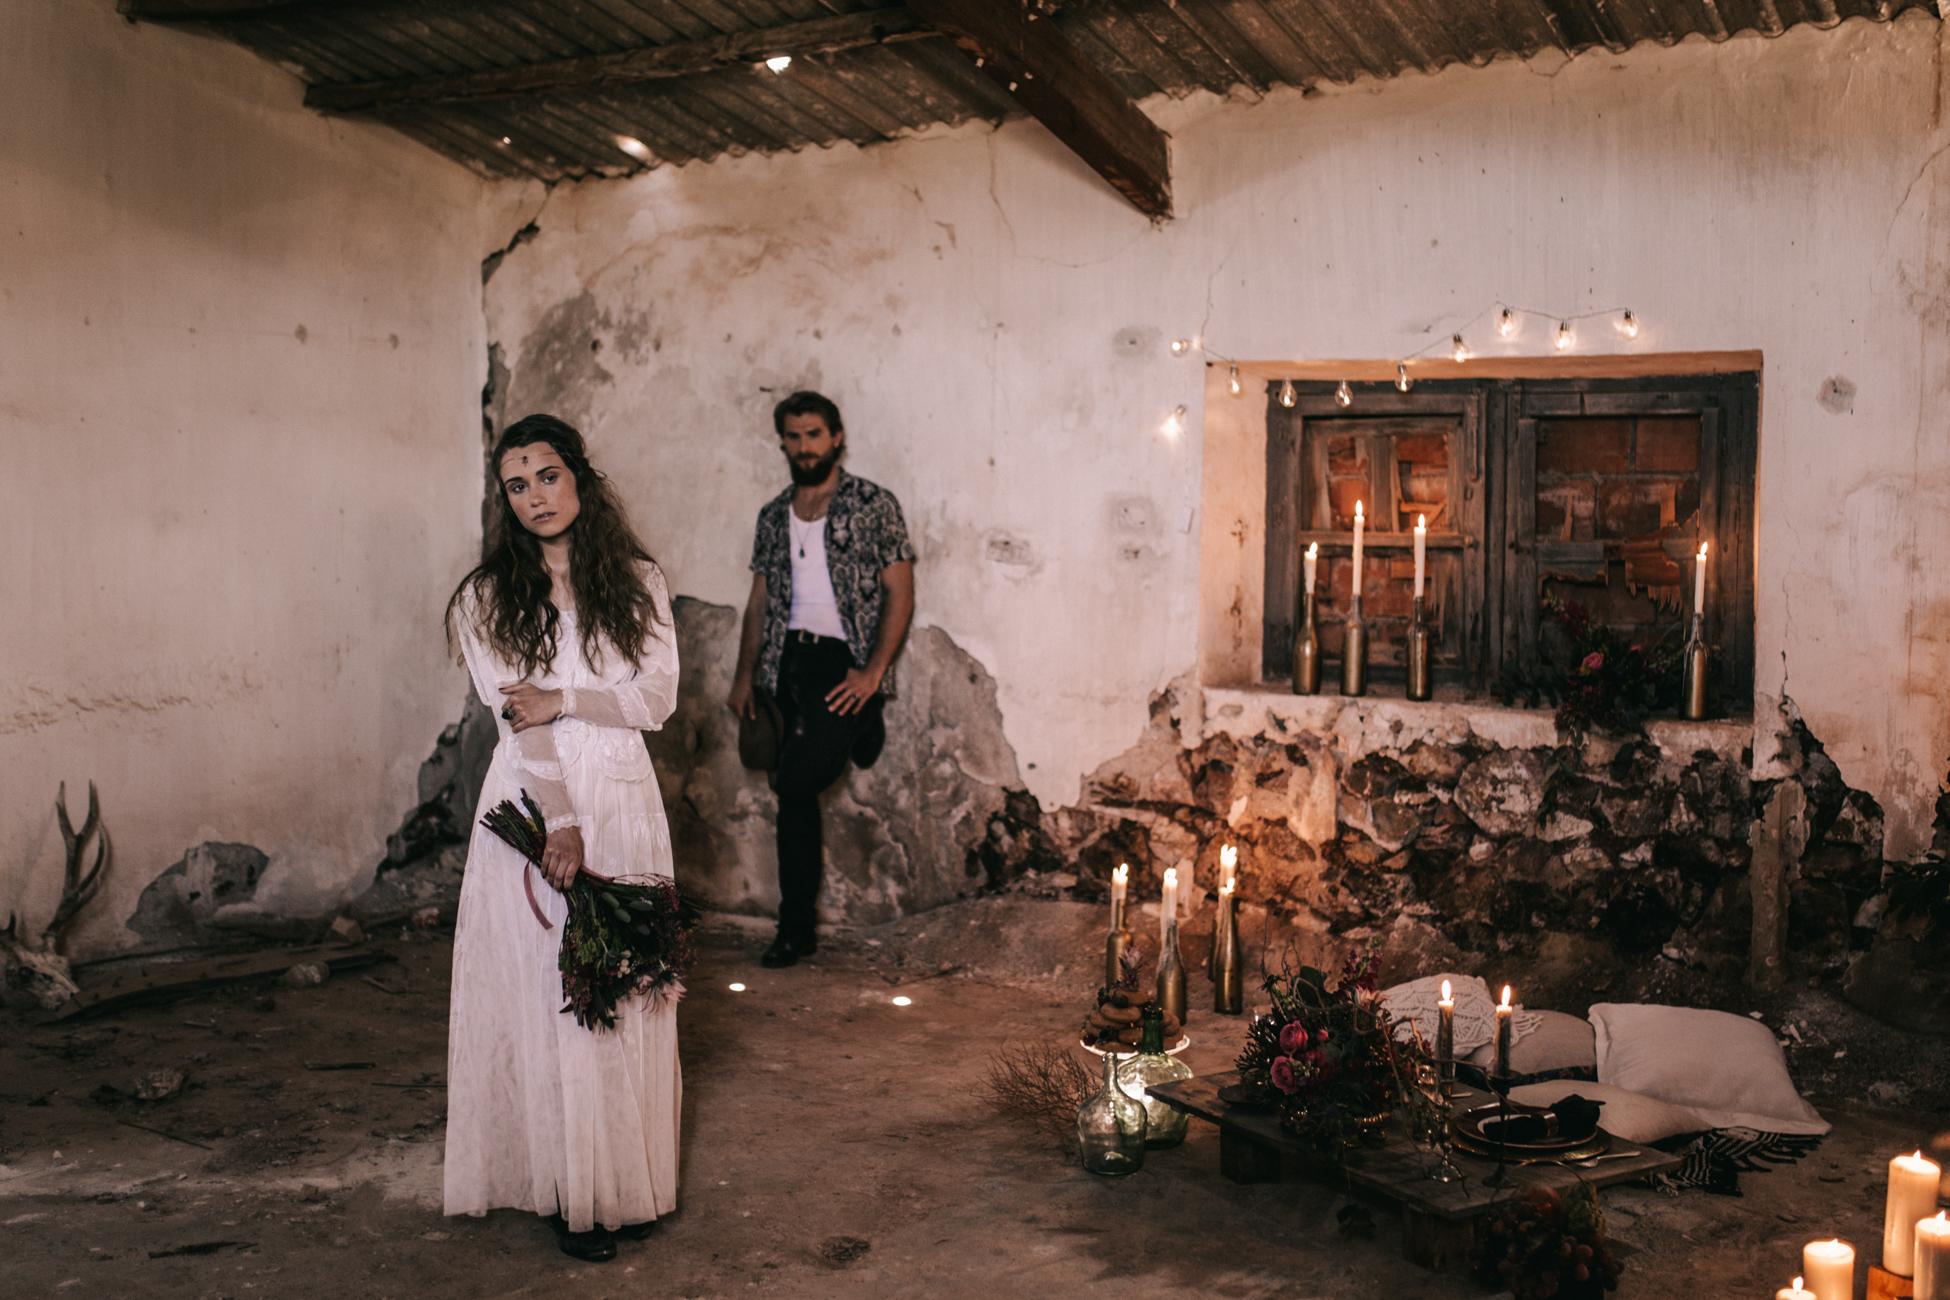 thenortherngirlphotography_photography_thenortherngirl_rebeccascabros_wedding_weddingphotography_weddingphotographer_wood_muebles_deco_bodasdecaramelo_home_bedtime_gaywedding_editorial_desierto_desert_wildestdreams_amortexano-155.jpg